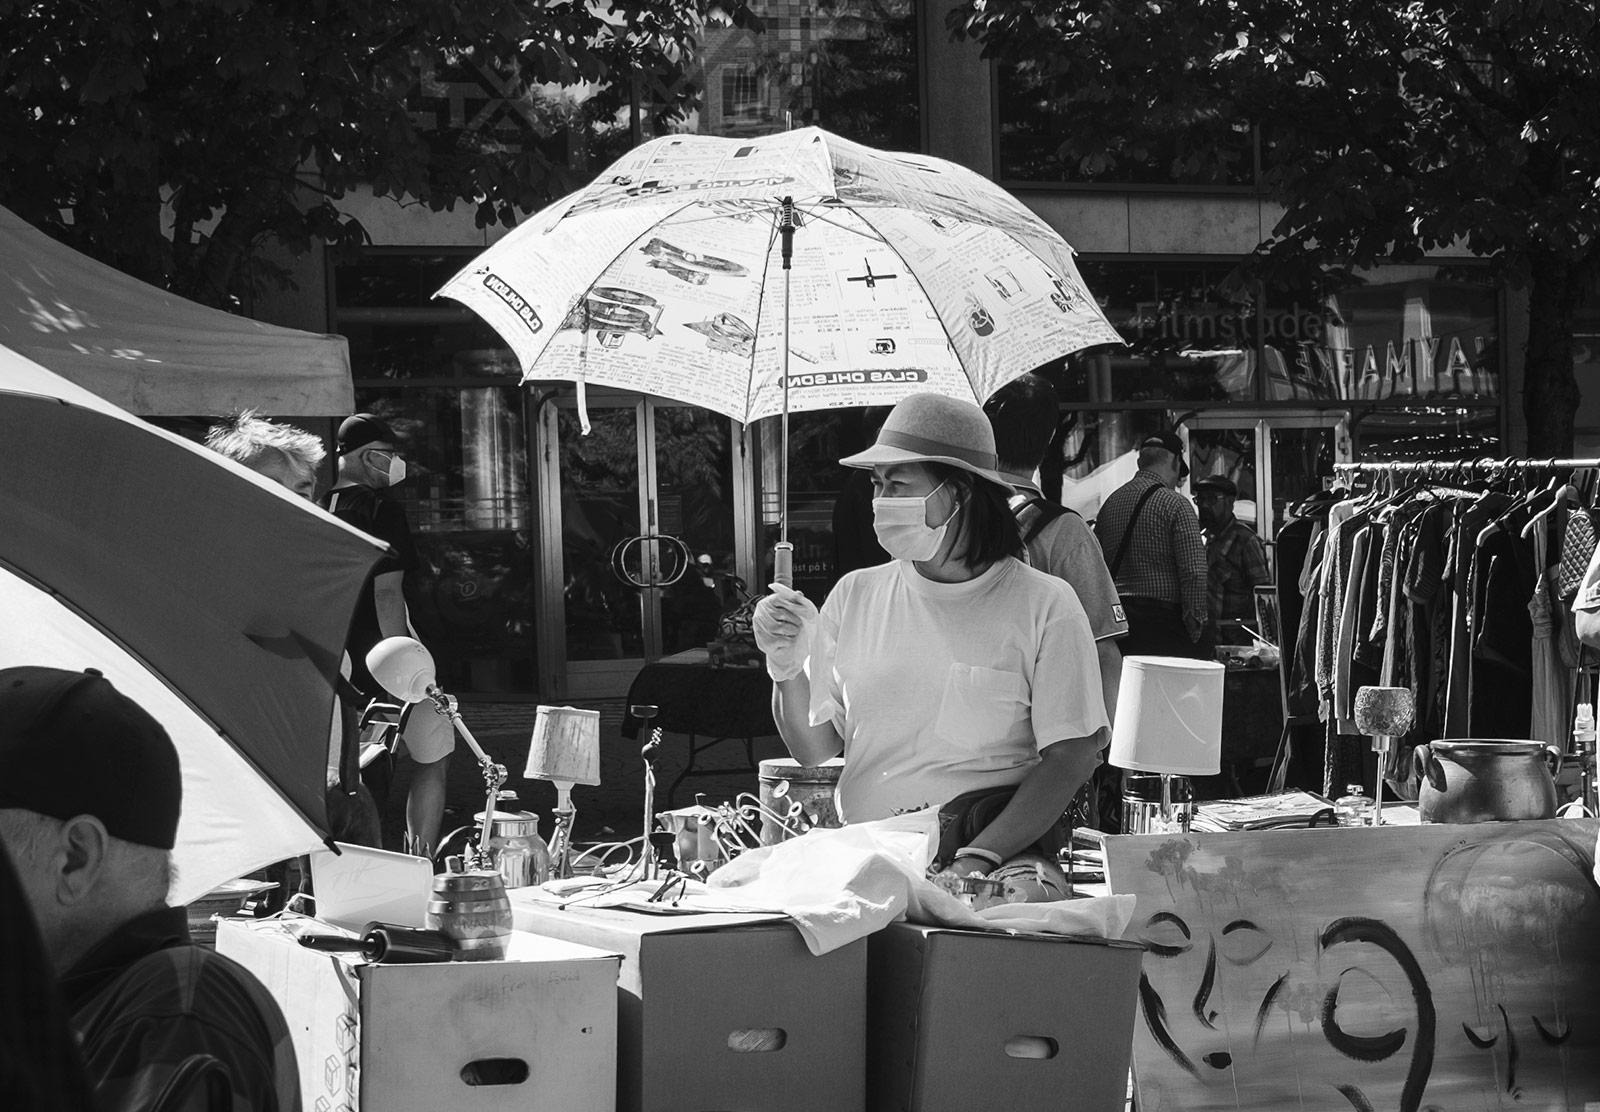 Woman in mask under umbrella